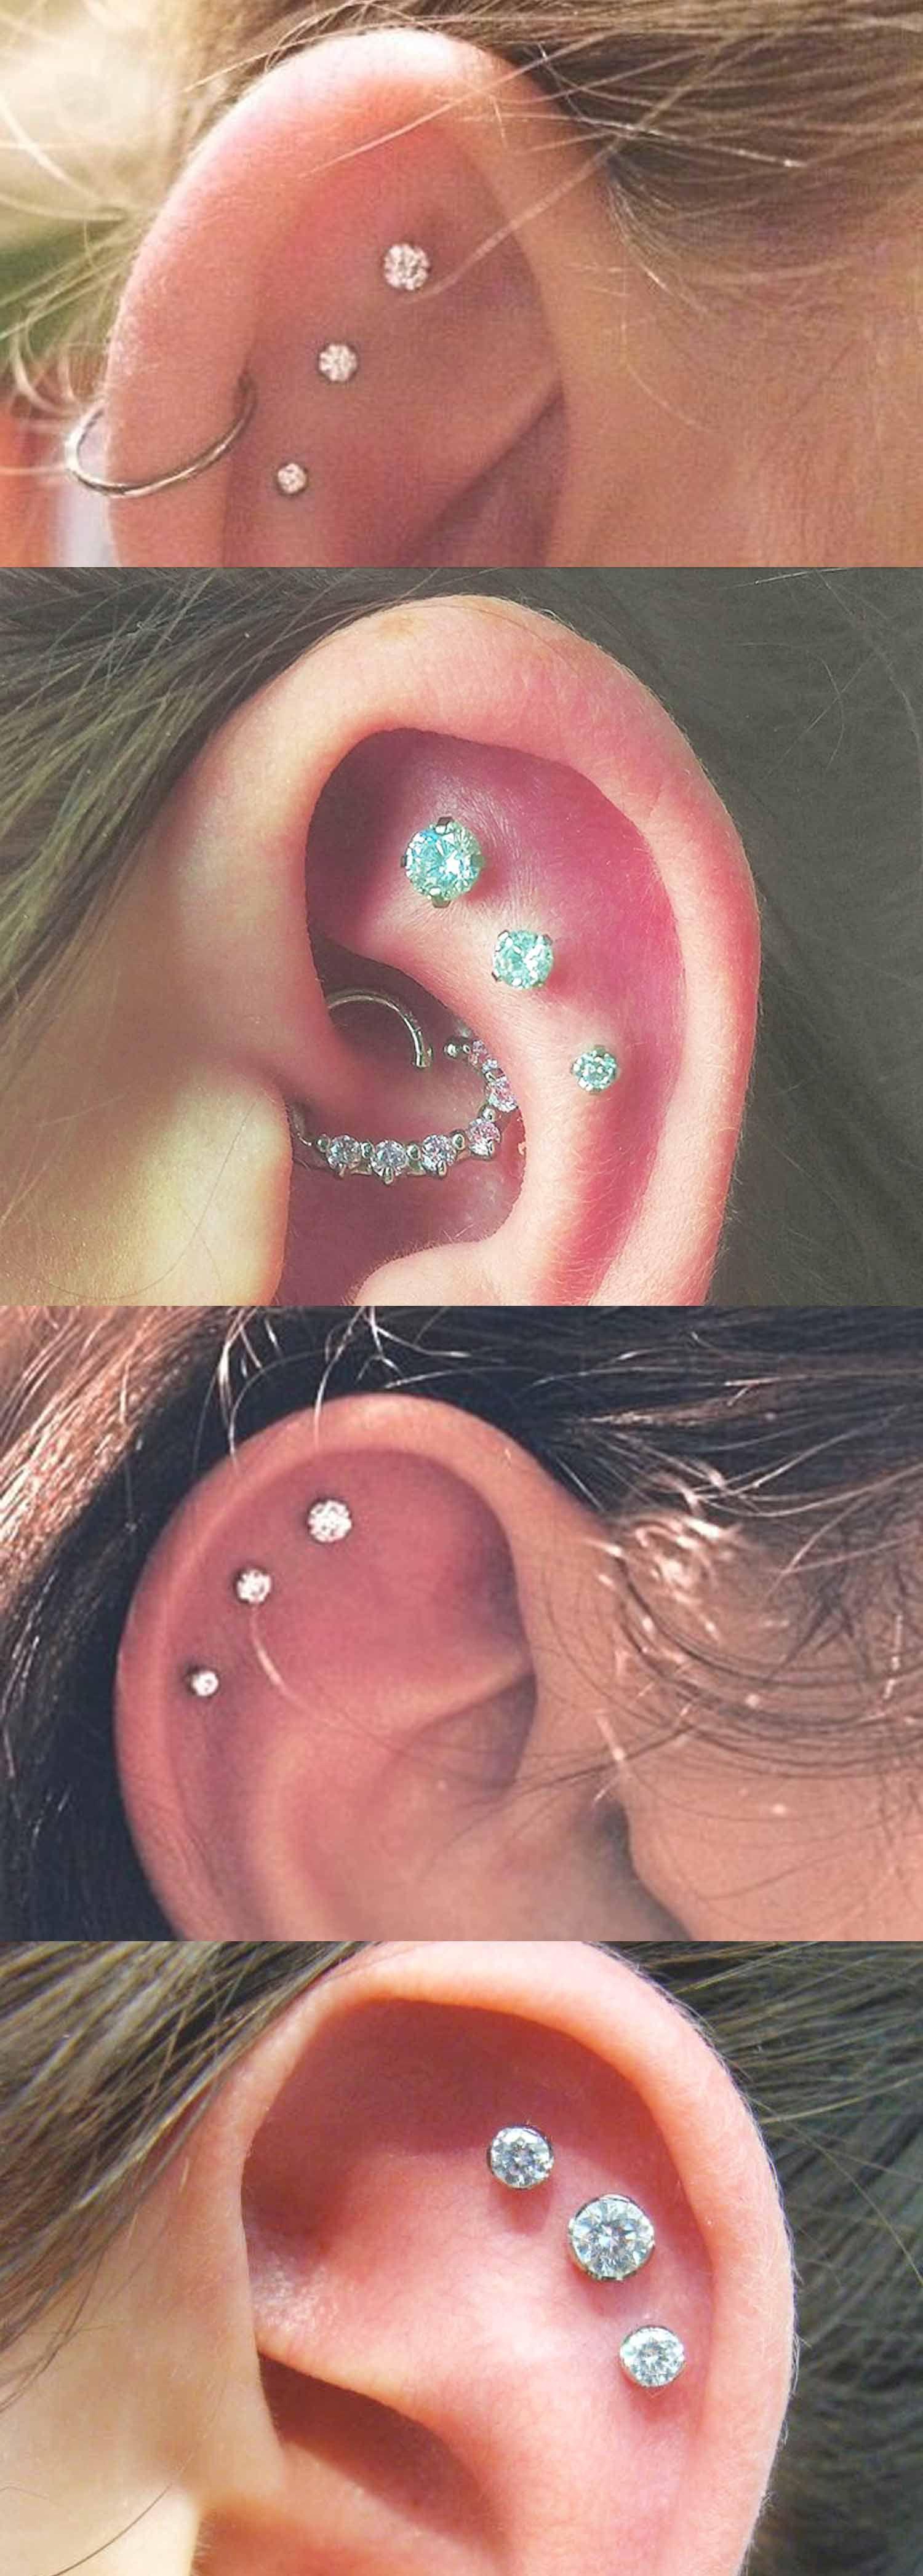 Nose piercing hoop vs stud  Alva Swarovski Crystal G Silver Barbell  Helix jewelry Cartilage